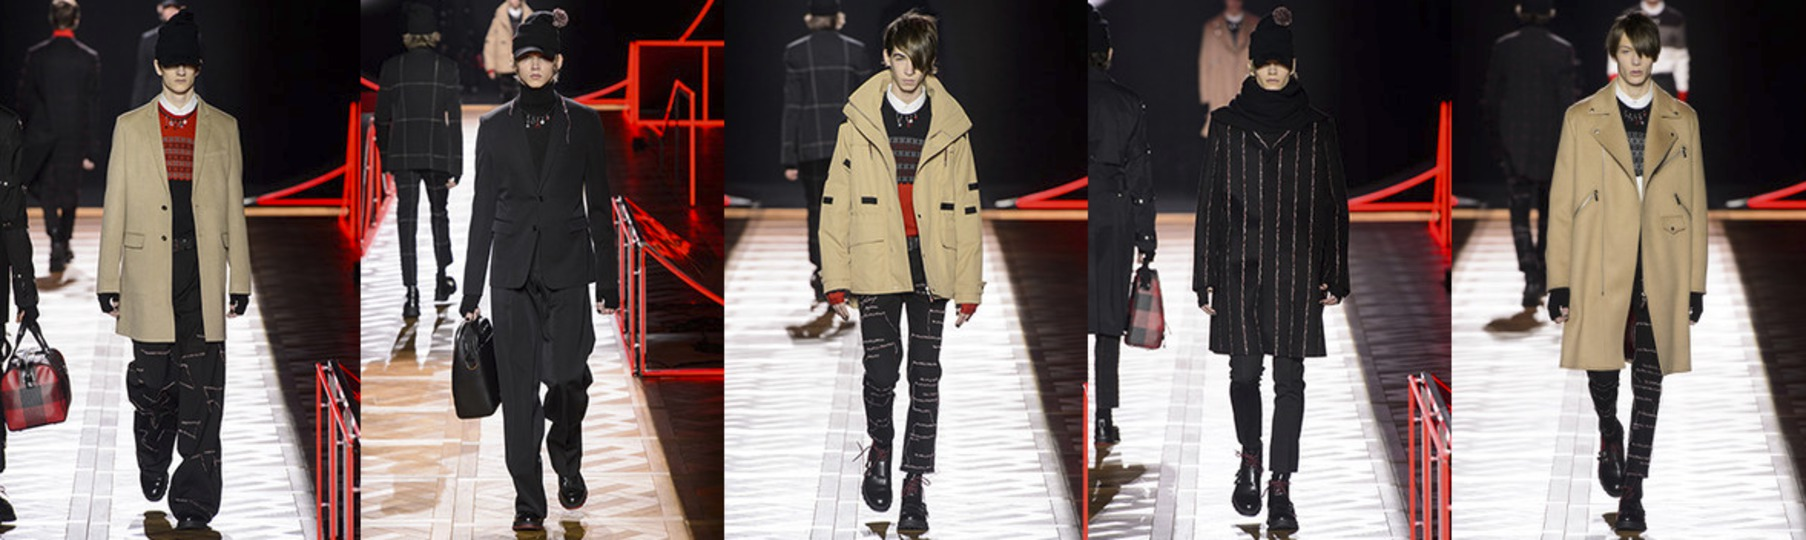 Dior Homme (Image 5)